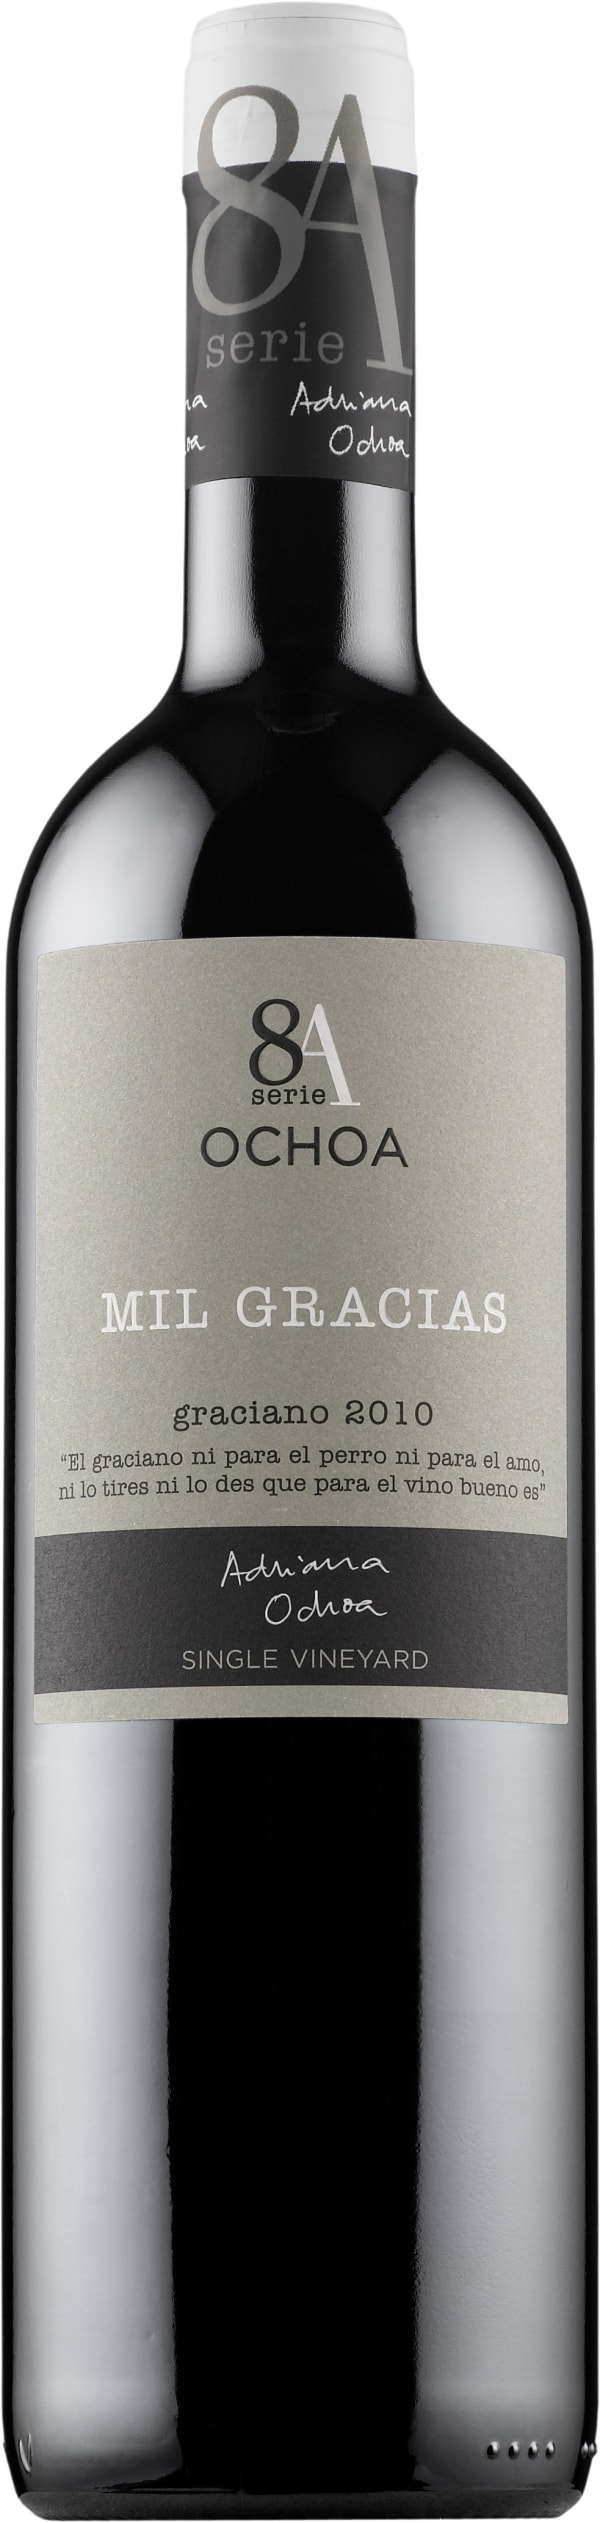 Ochoa Mil Gracias Graciano 2012